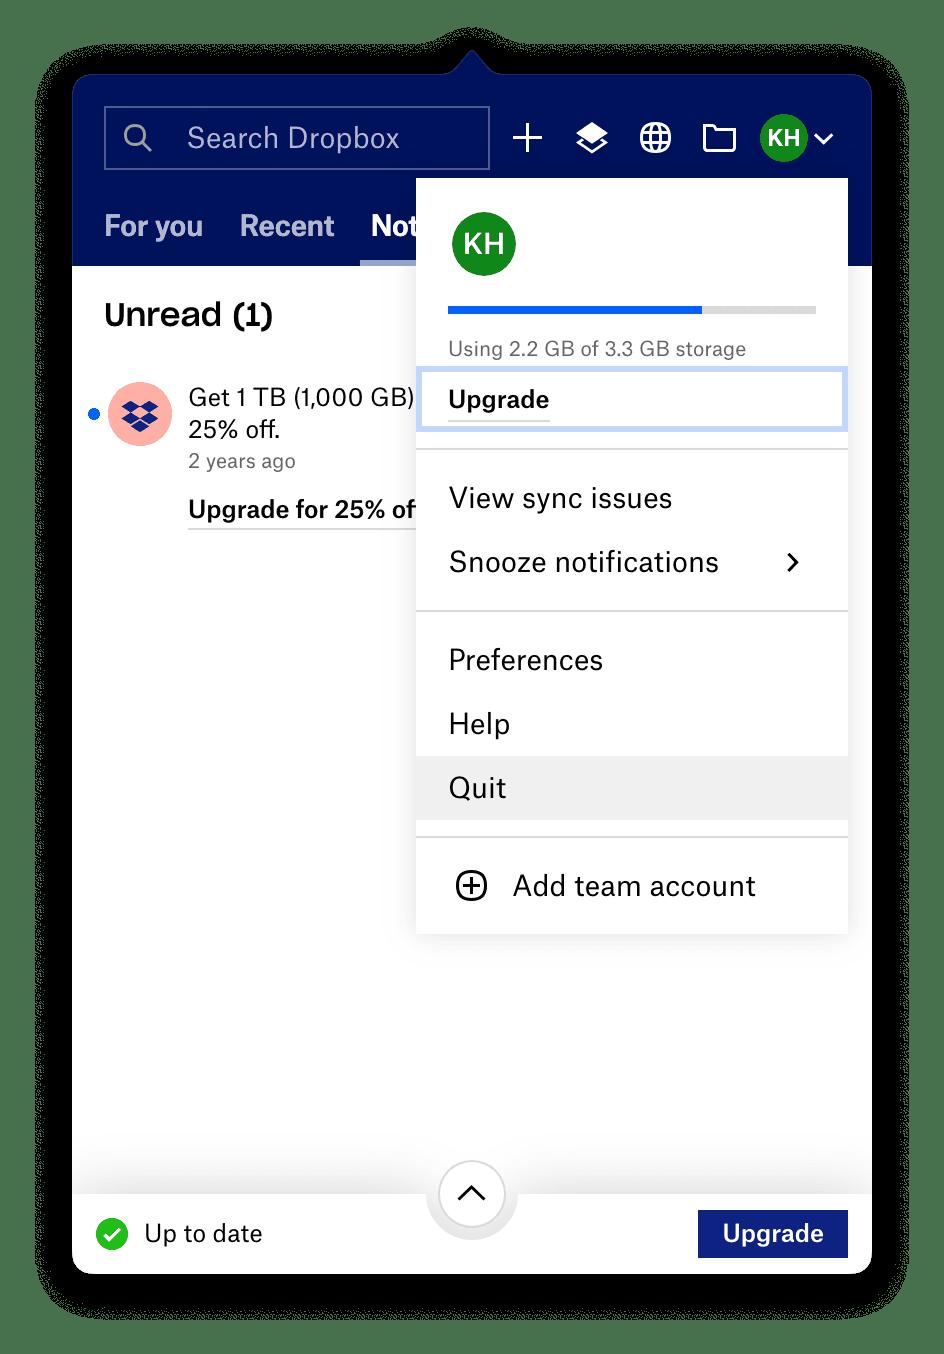 How to quit Dropbox